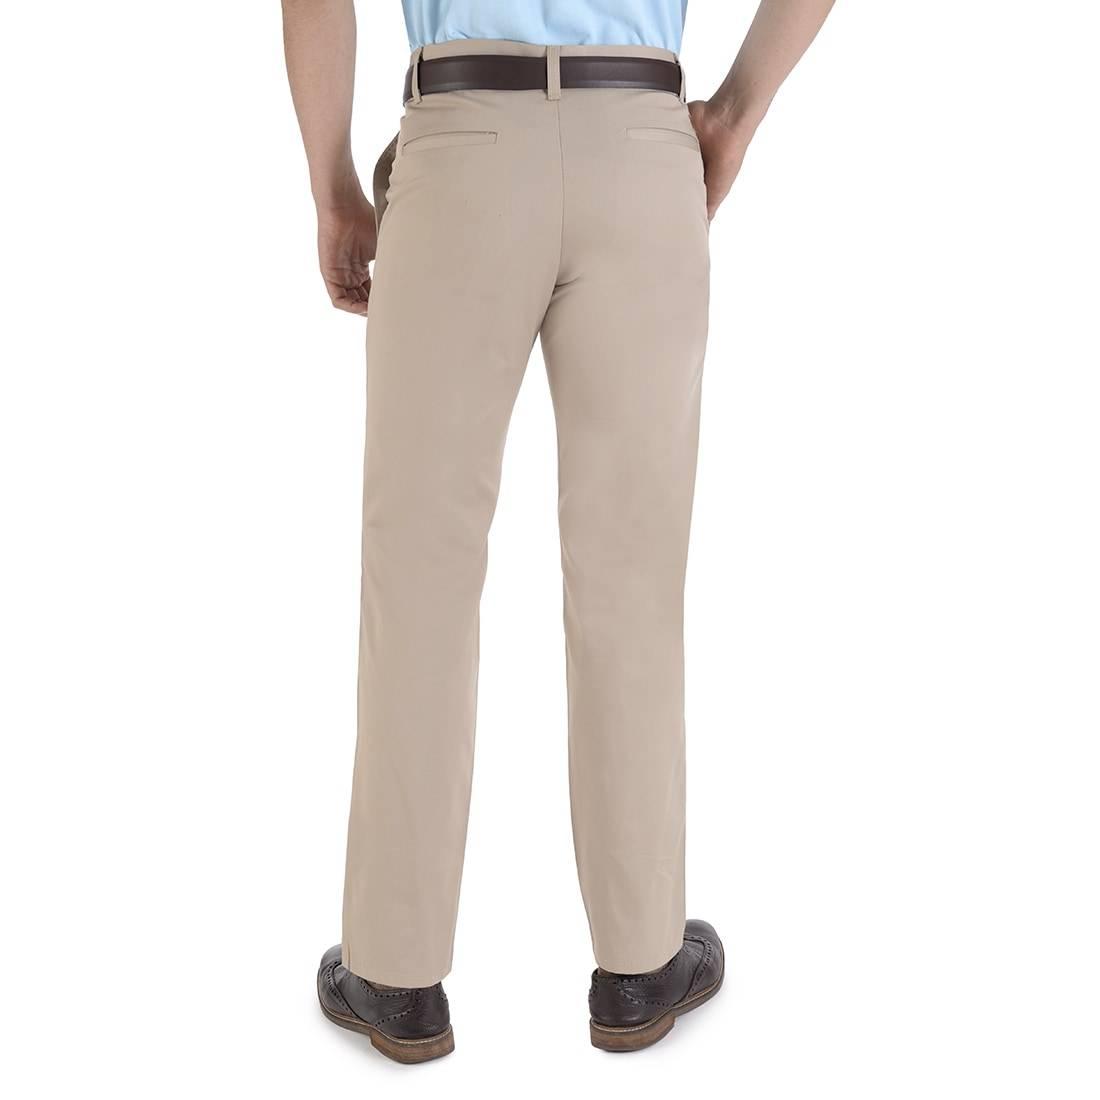 010920418961-02-Pantalon-Casual-Slim-Fit-Beige-yale